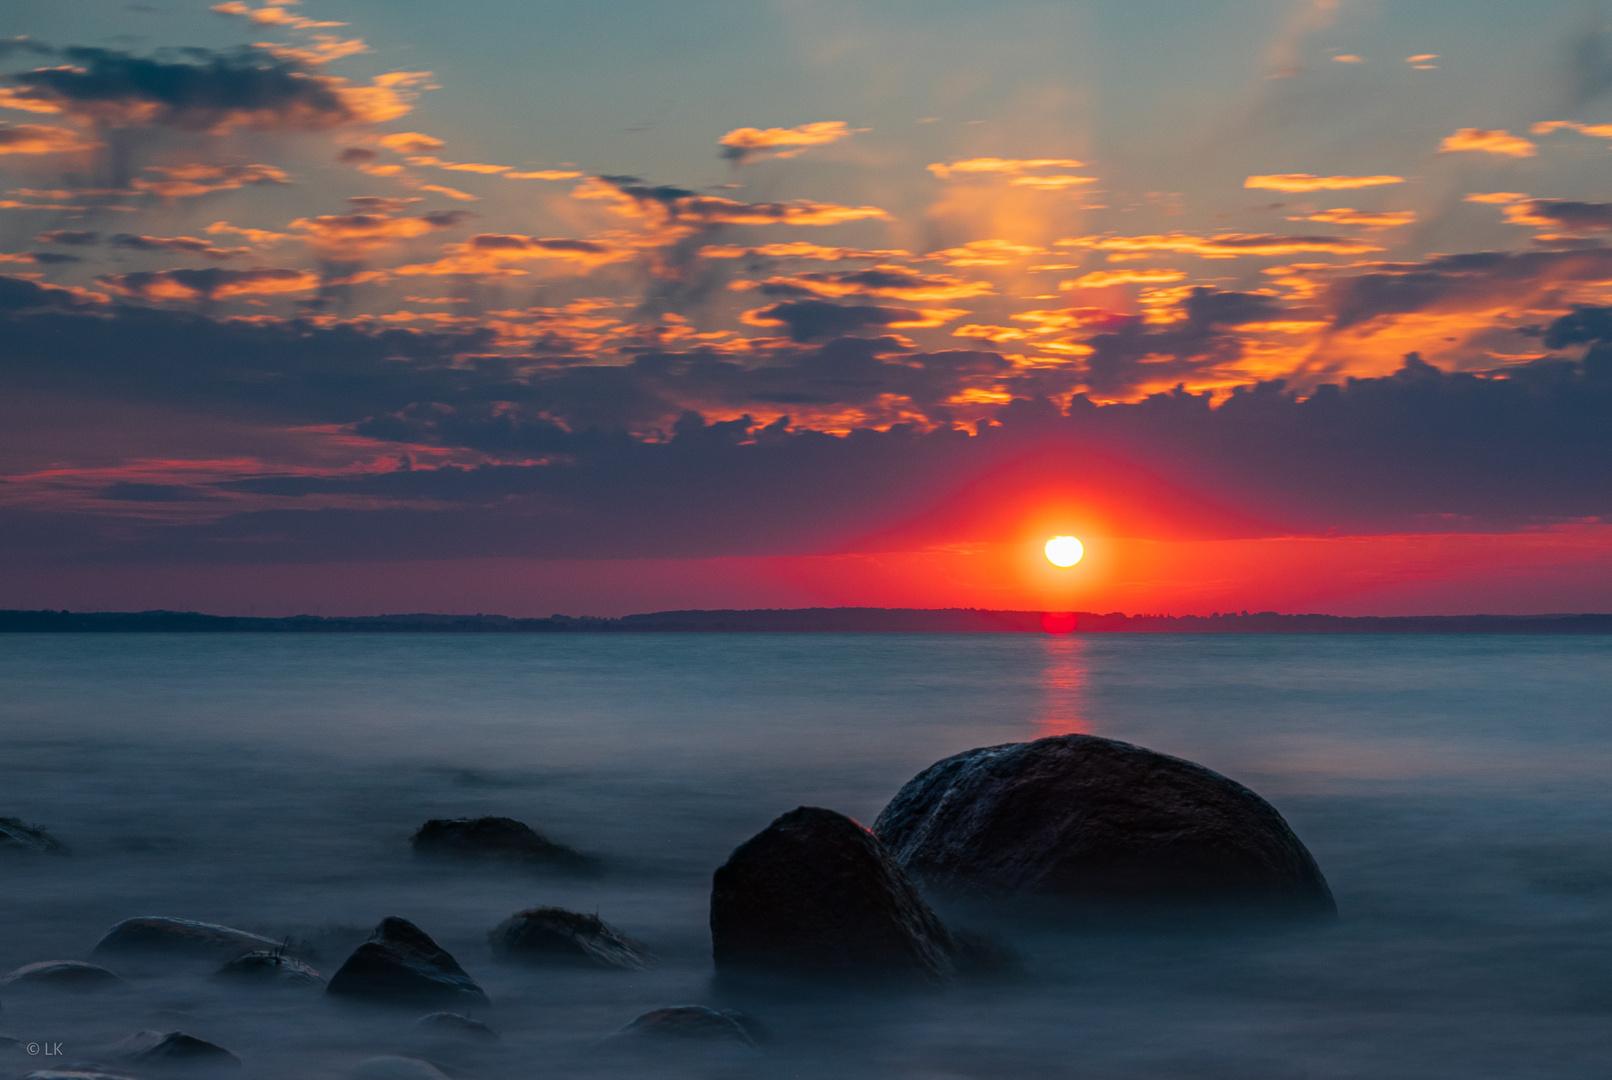 Sonnenuntergang am Brodtener Ufer